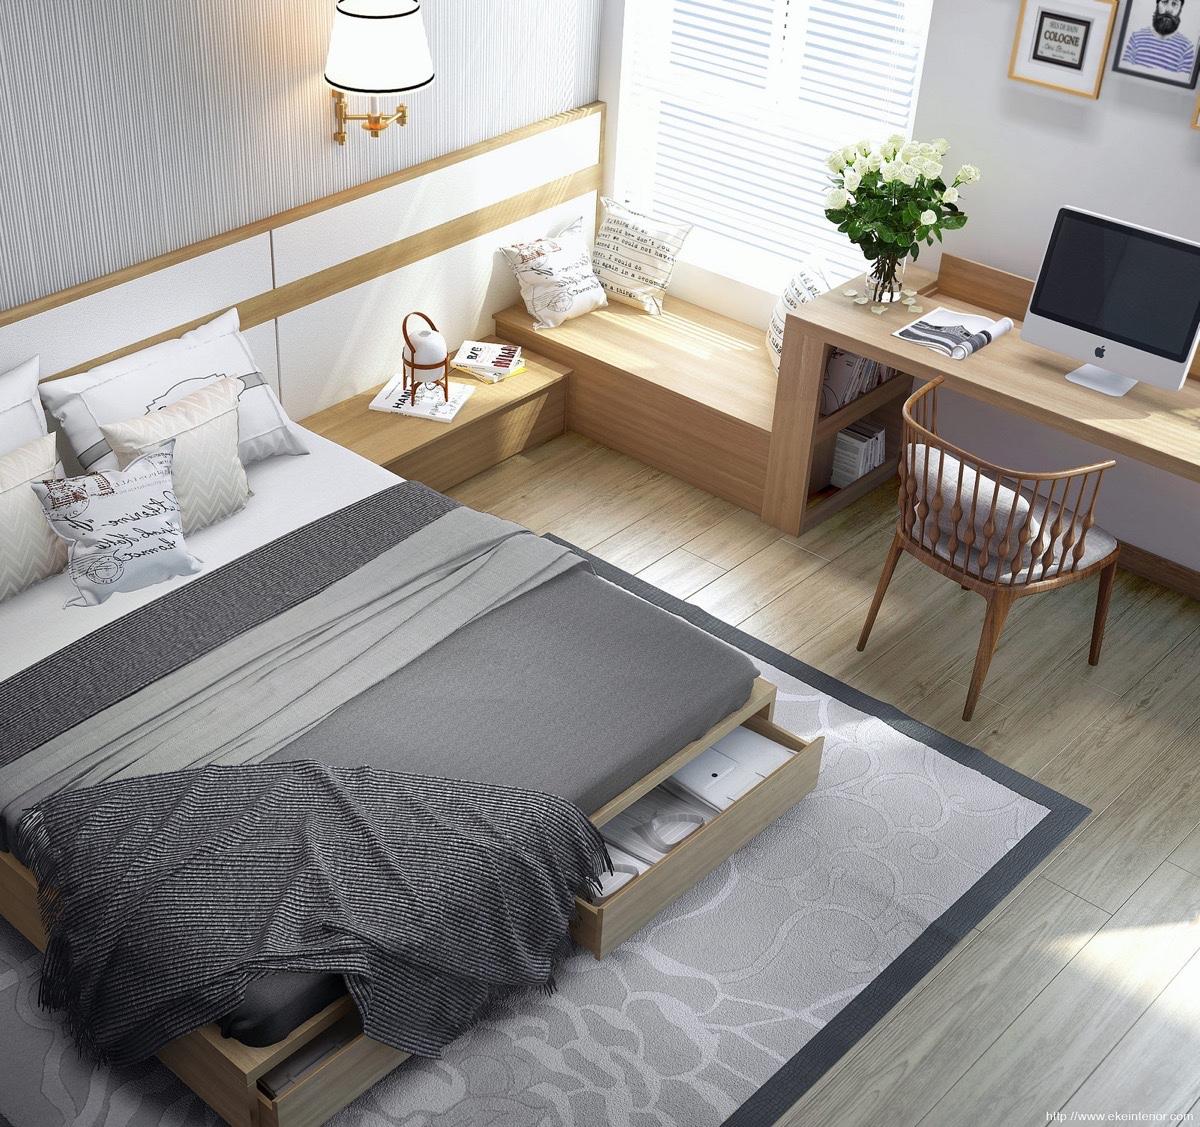 multipurpose-furniture-in-simple-bedroom